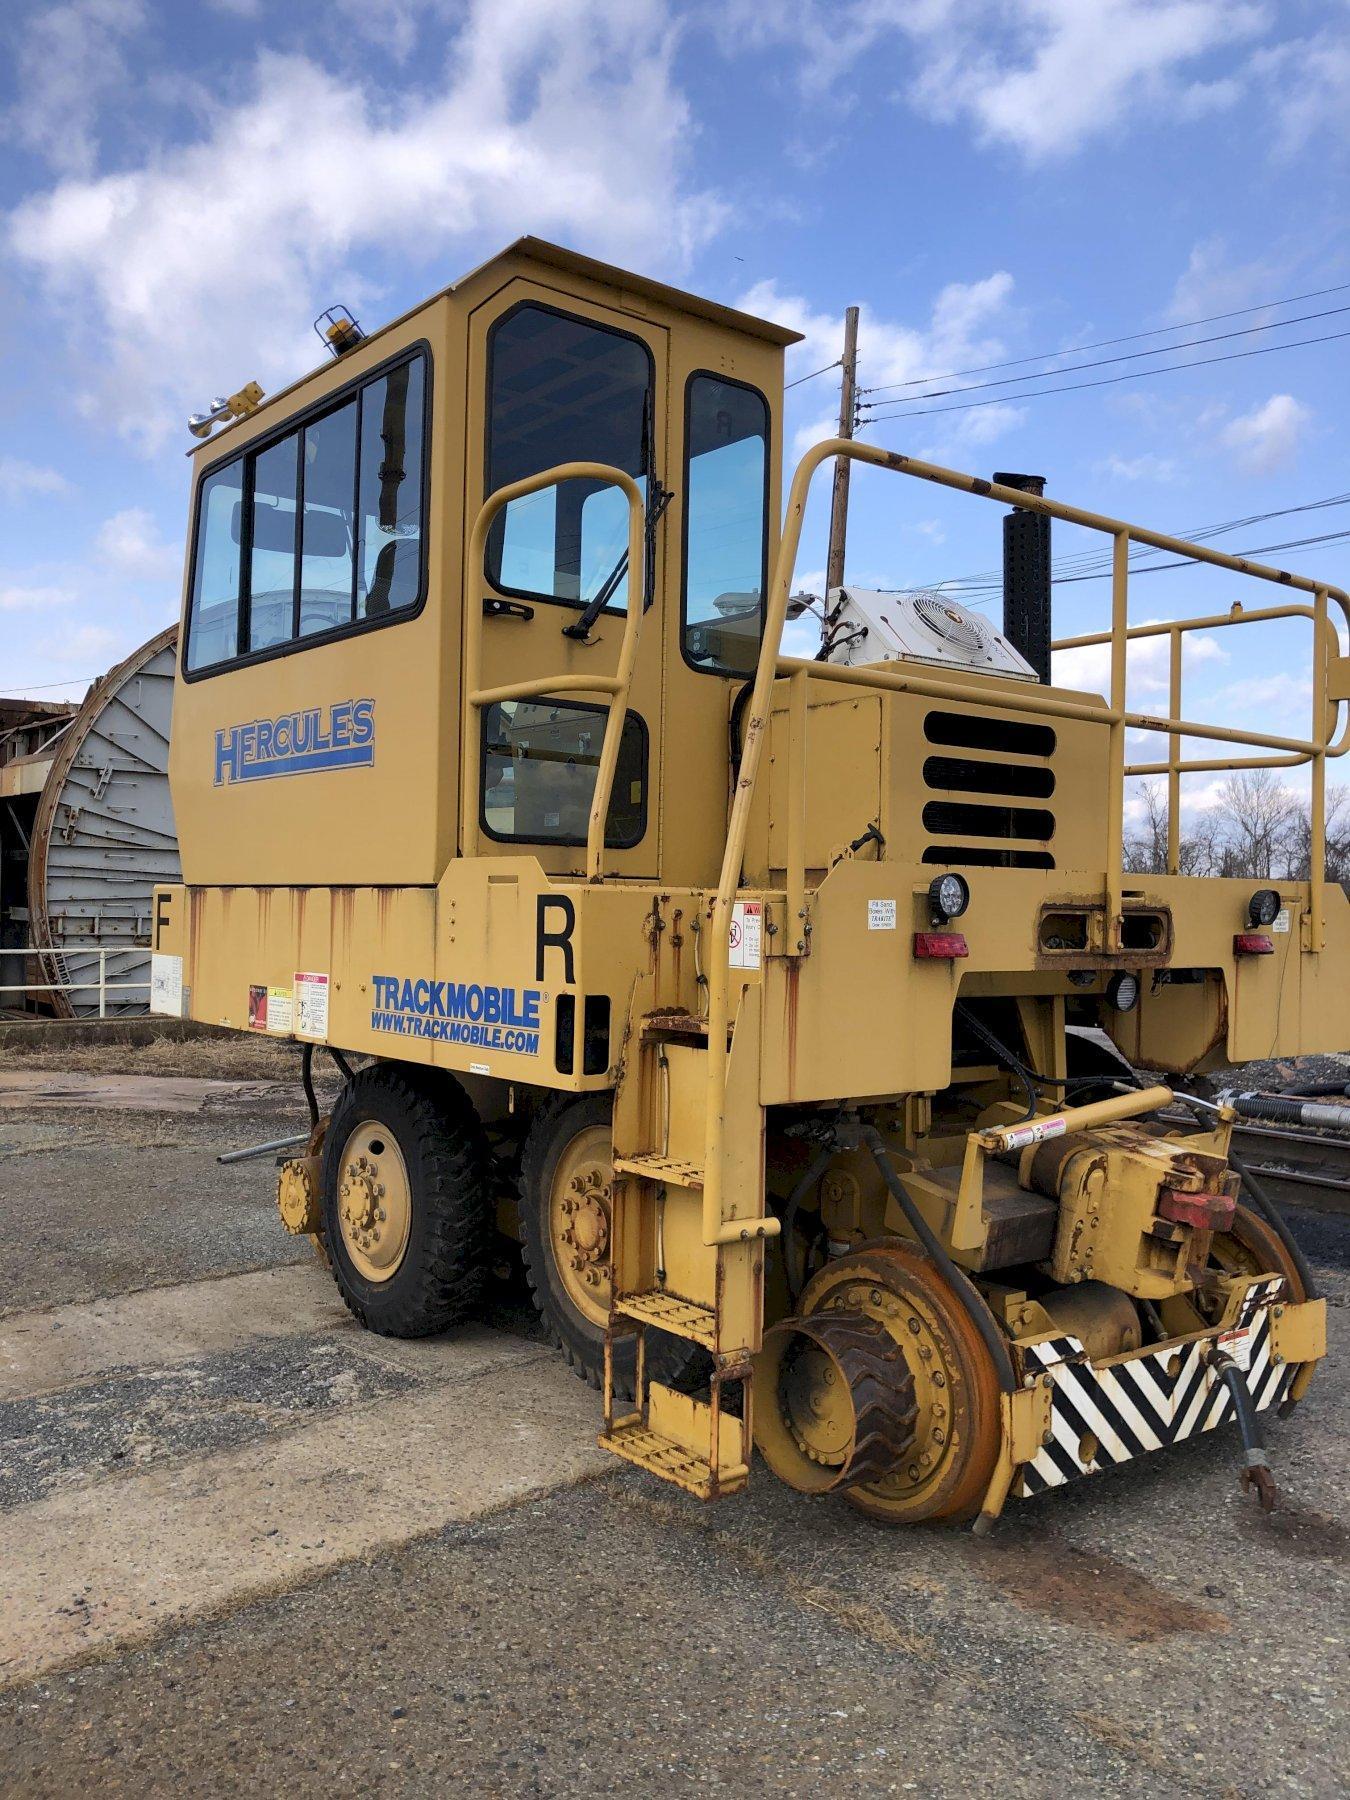 Trackmobile Hercules rail mover s/n lgn987120609